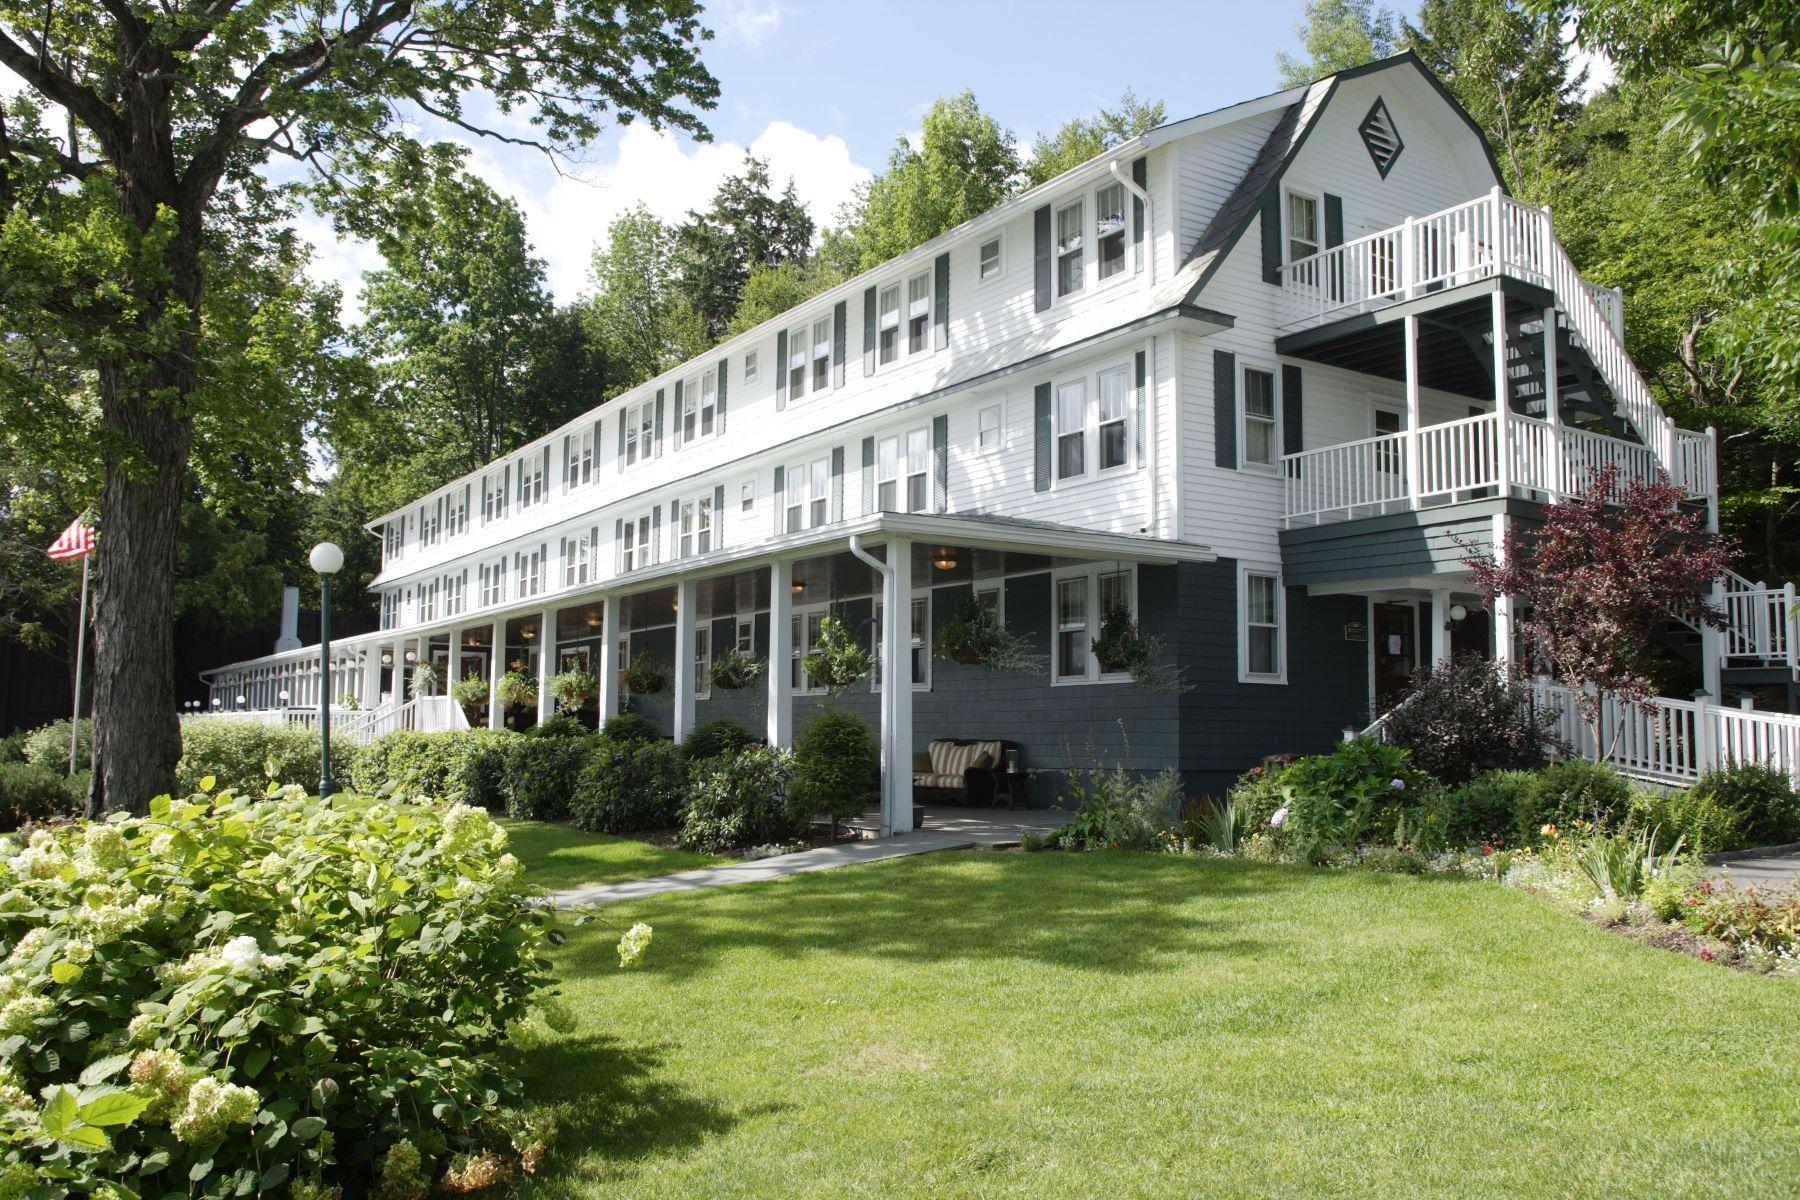 Single Family Homes por un Venta en Chestnut Inn on Oquaga Lake 505 Oquaga Lake Road Sanford, Nueva York 13754 Estados Unidos